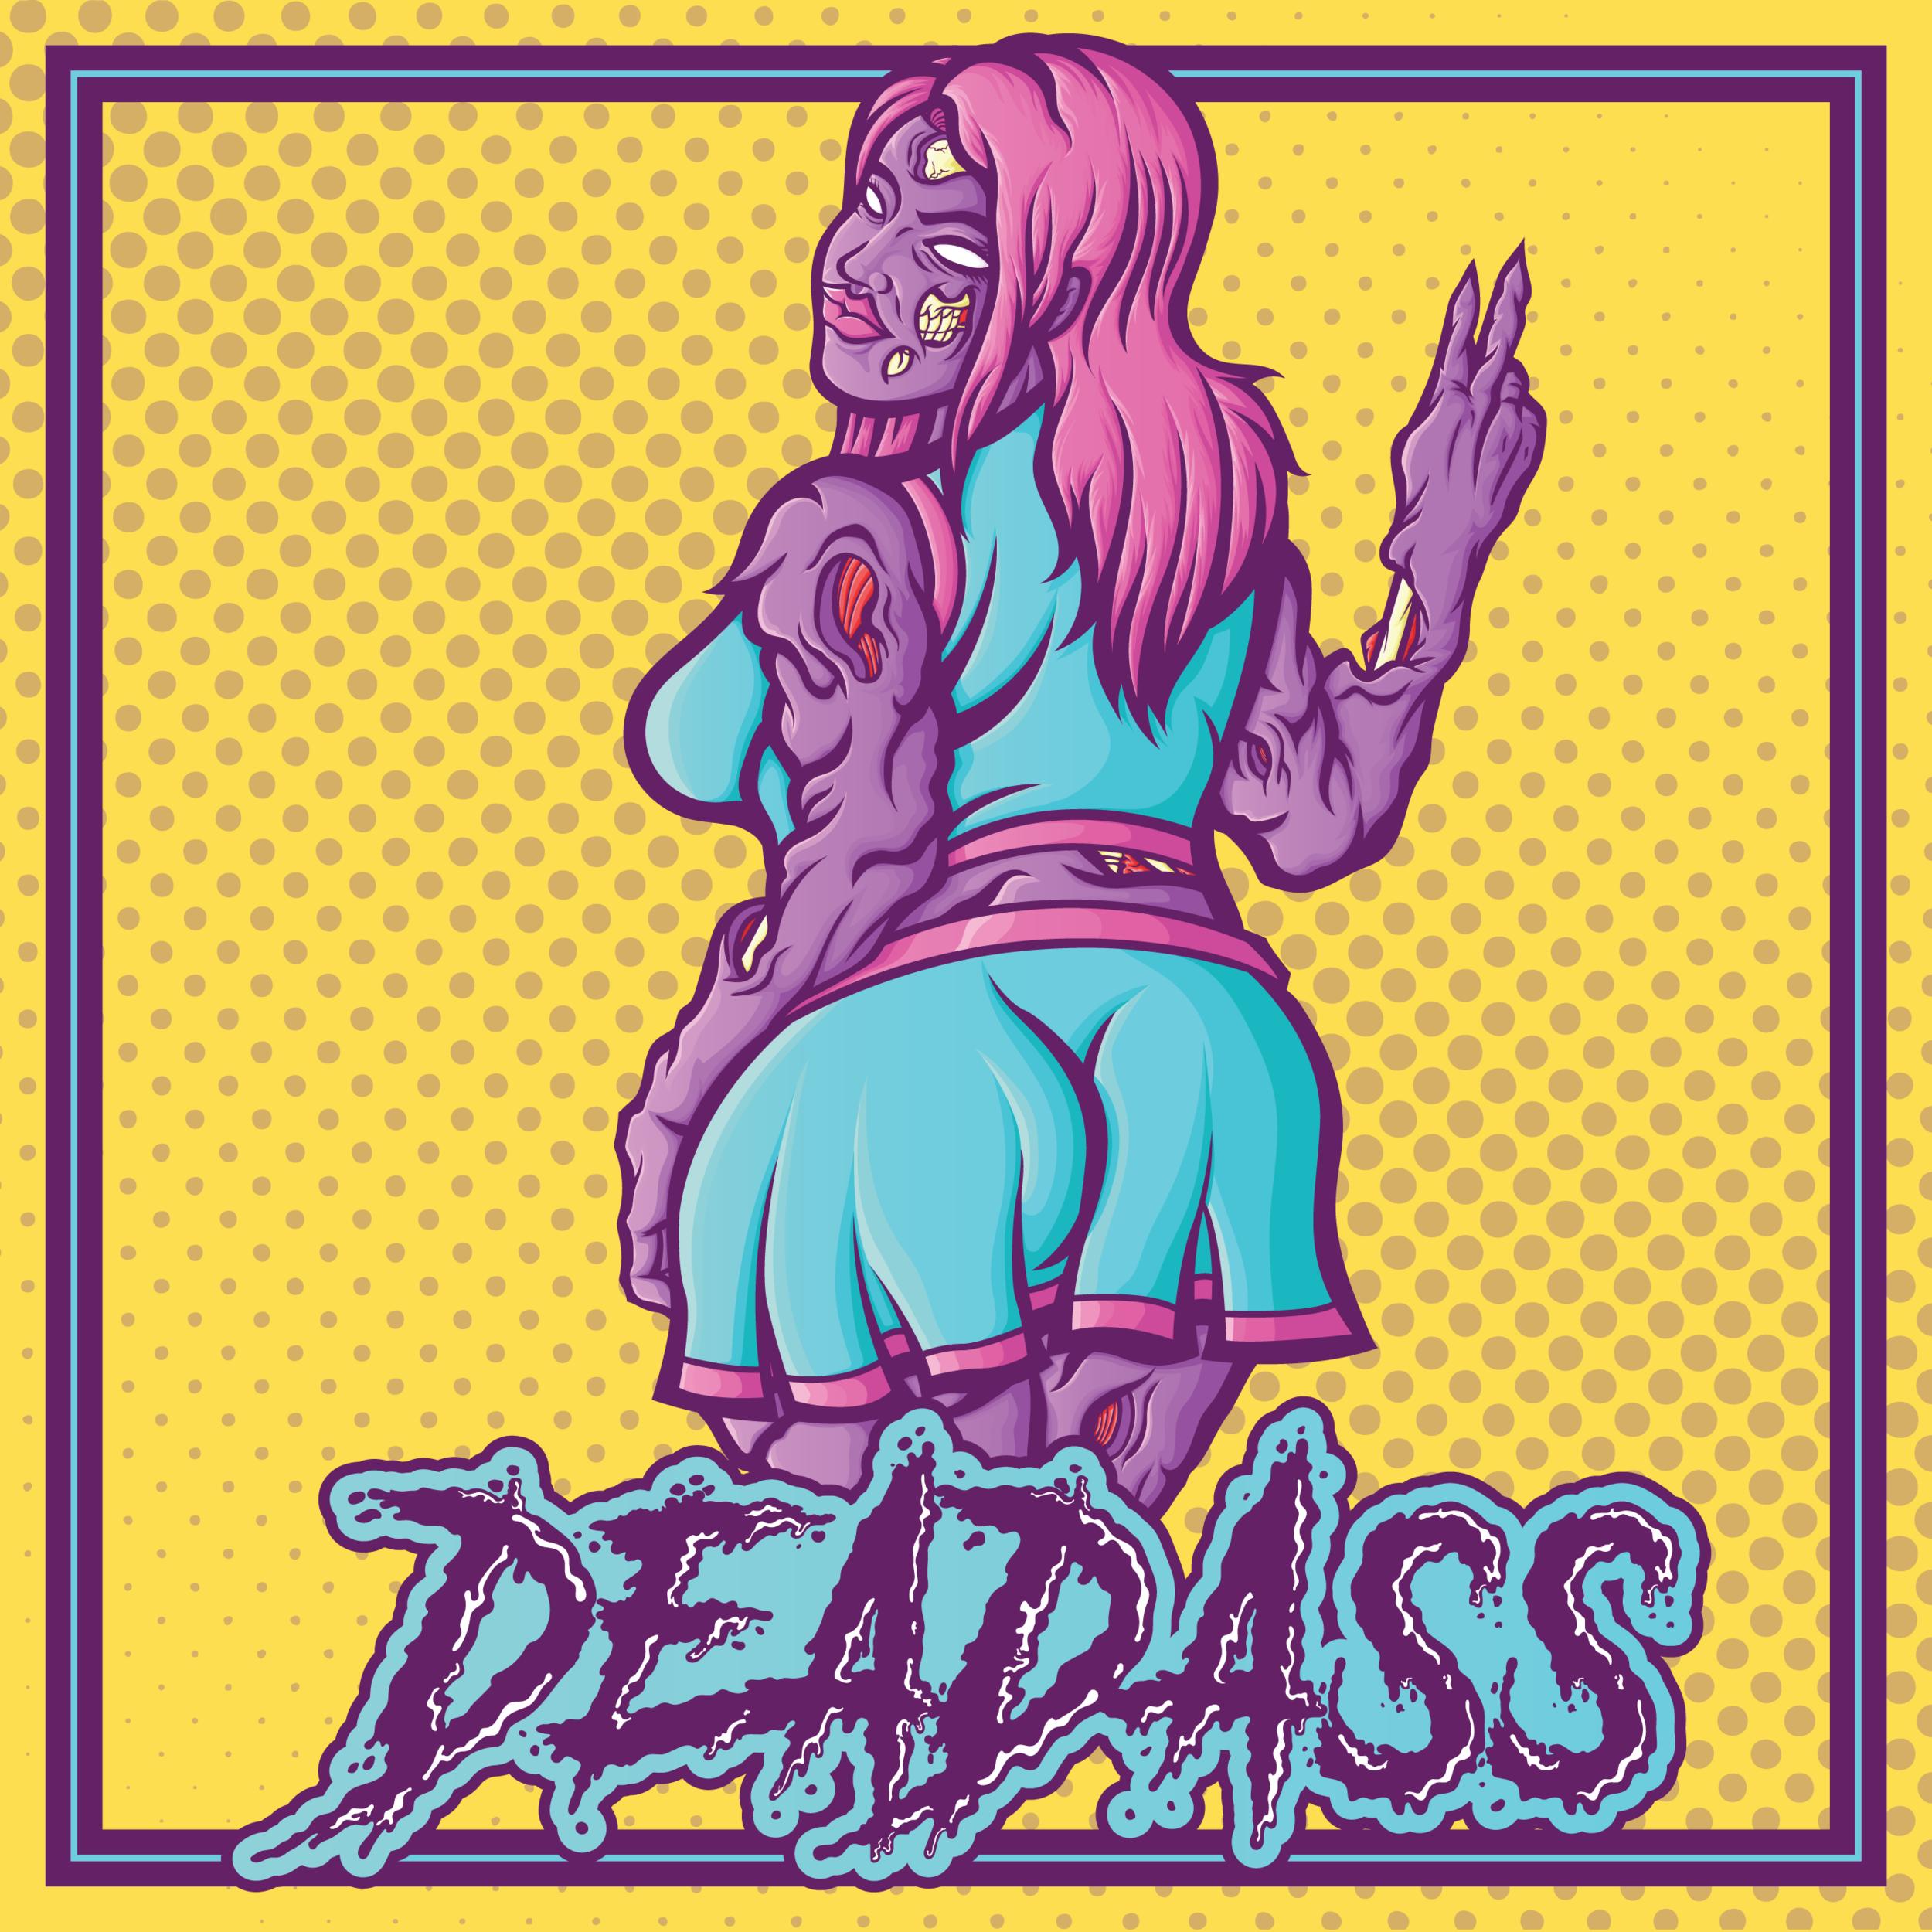 deadass-podcast-logo-vector-illustration-itunes-orozcodesign.jpg